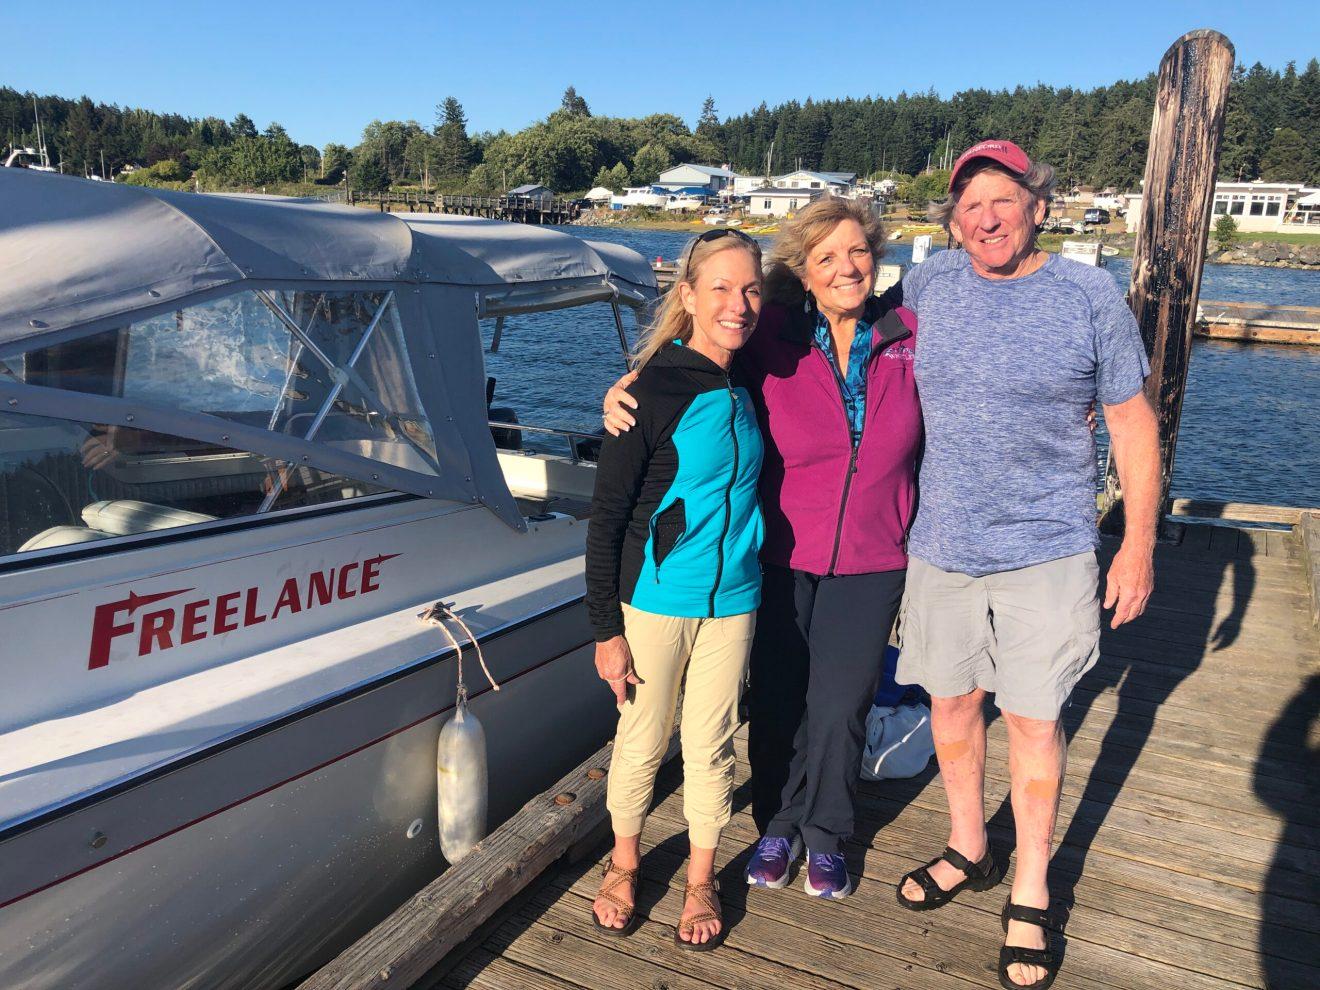 Three OWAC Members' Surprising Meet Up Three States Away